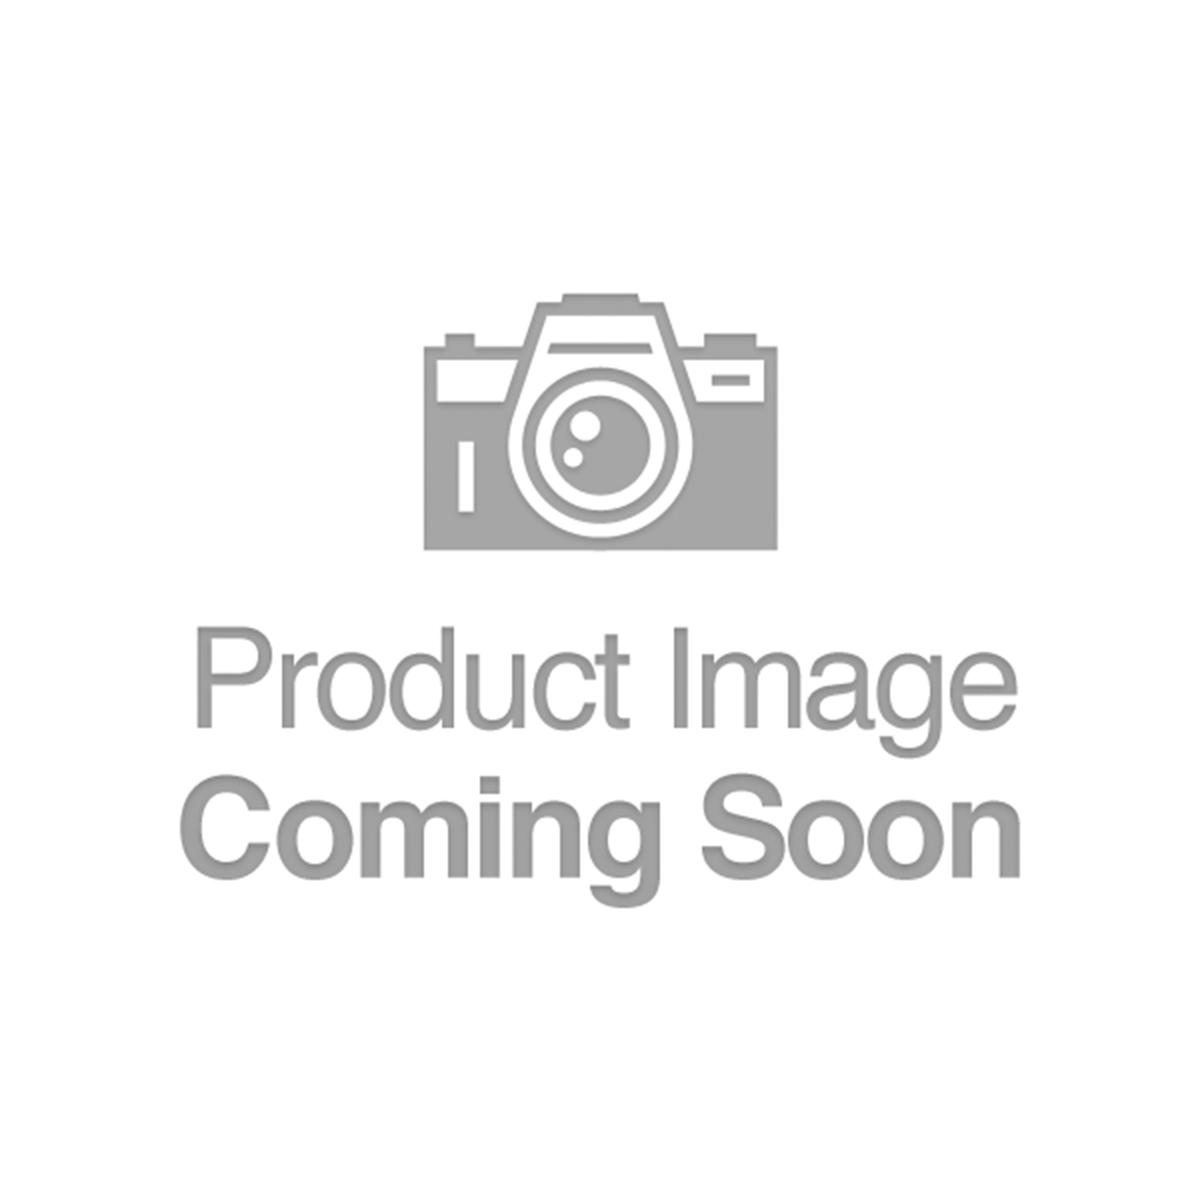 Quincy - Illinois - CH 2519 - FR 581 - PCGS 30